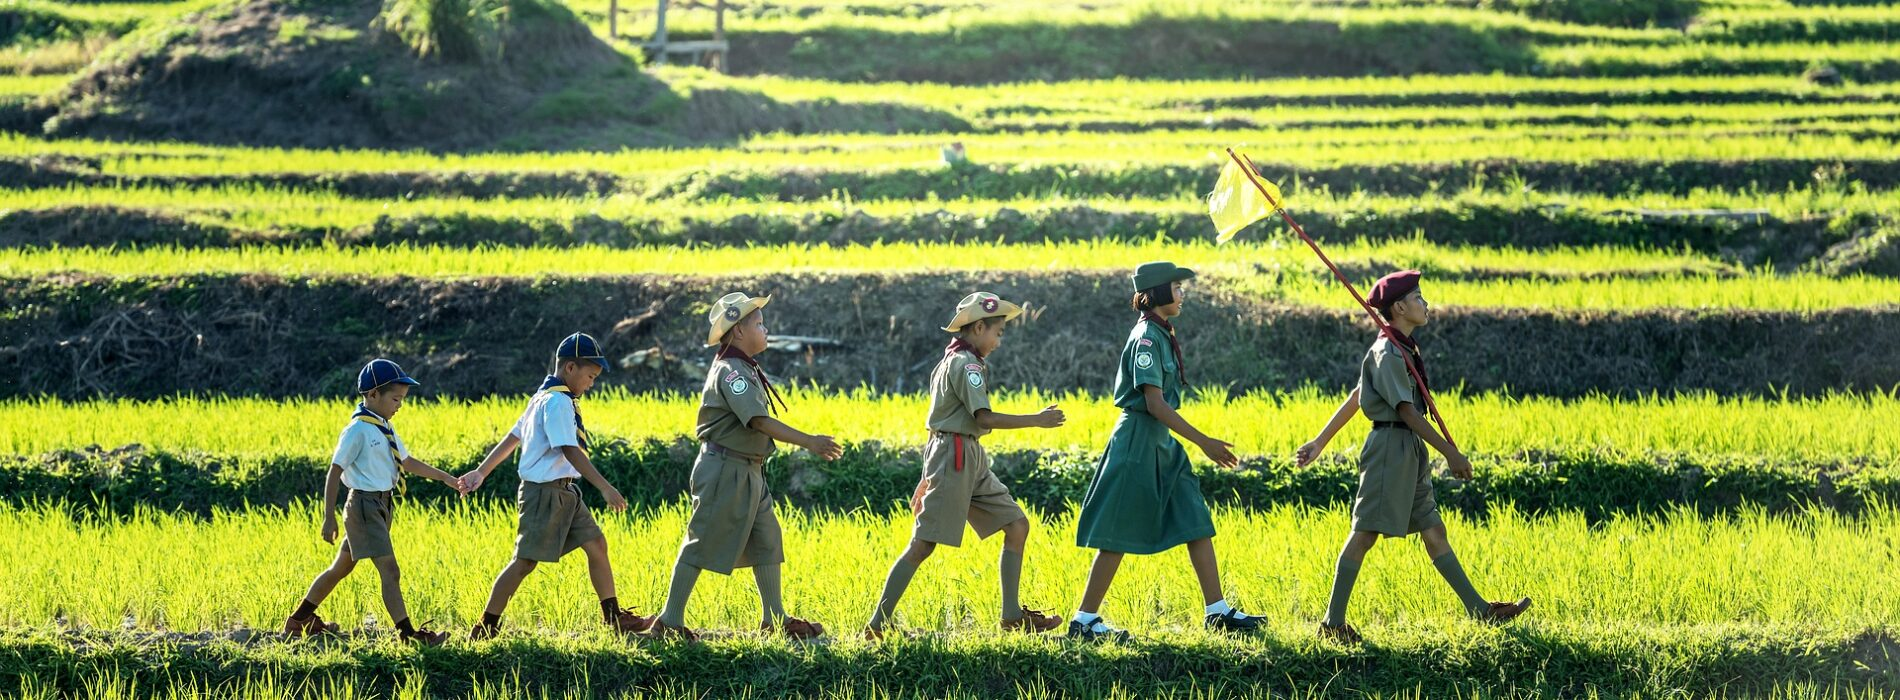 Thinking Day, giorno dello scoutismo in onore a Baden-Powell